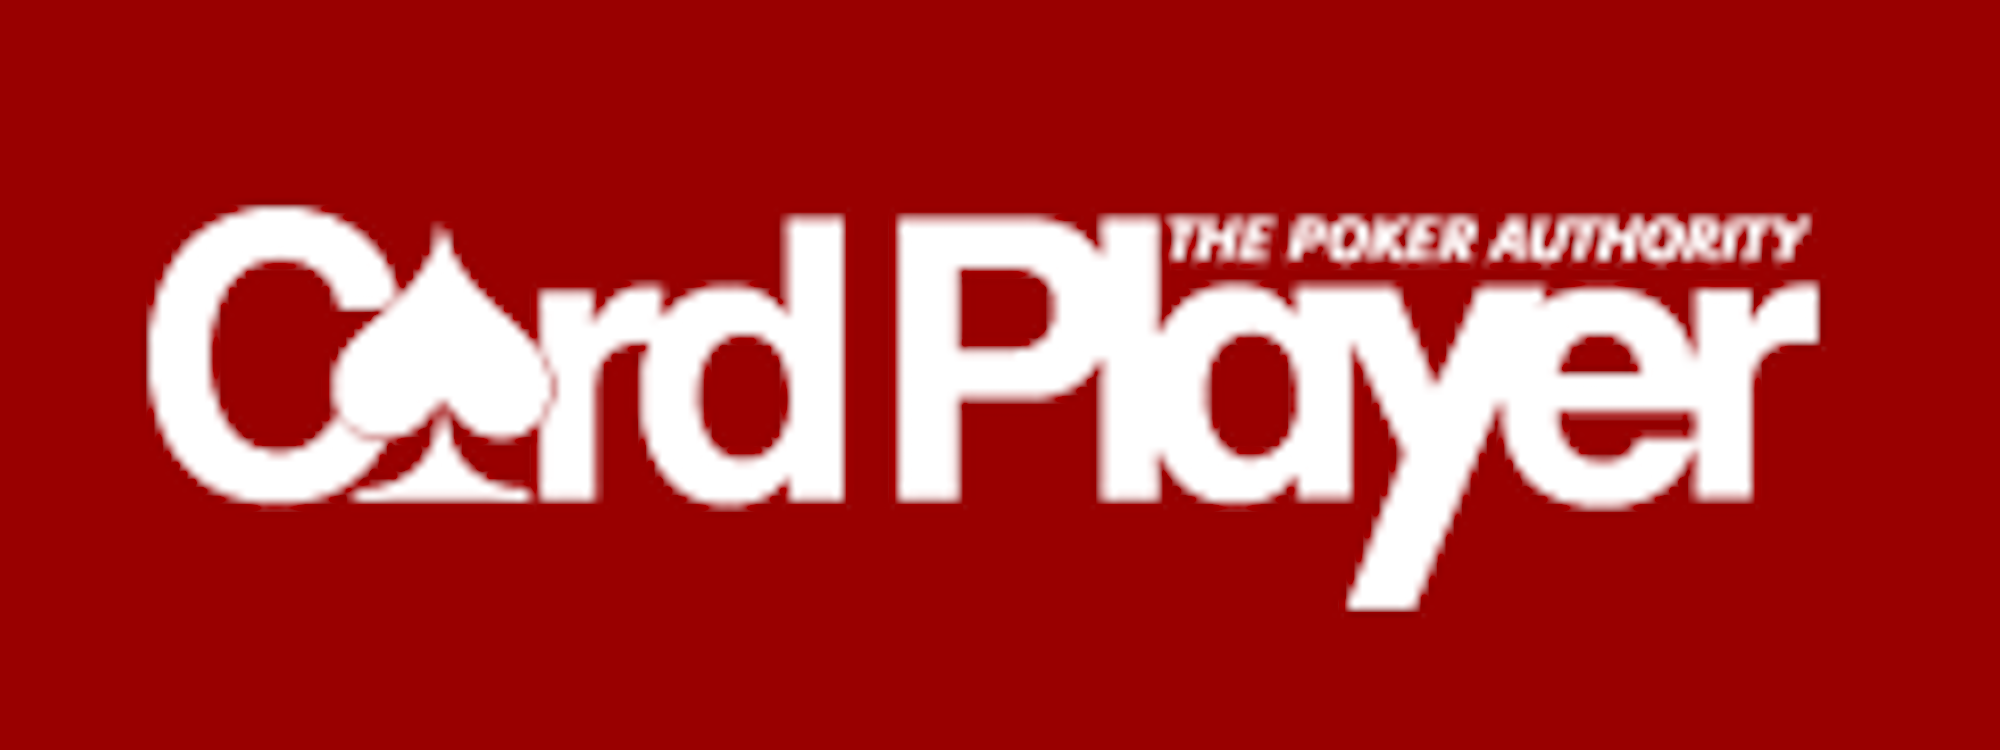 cardplayer.png